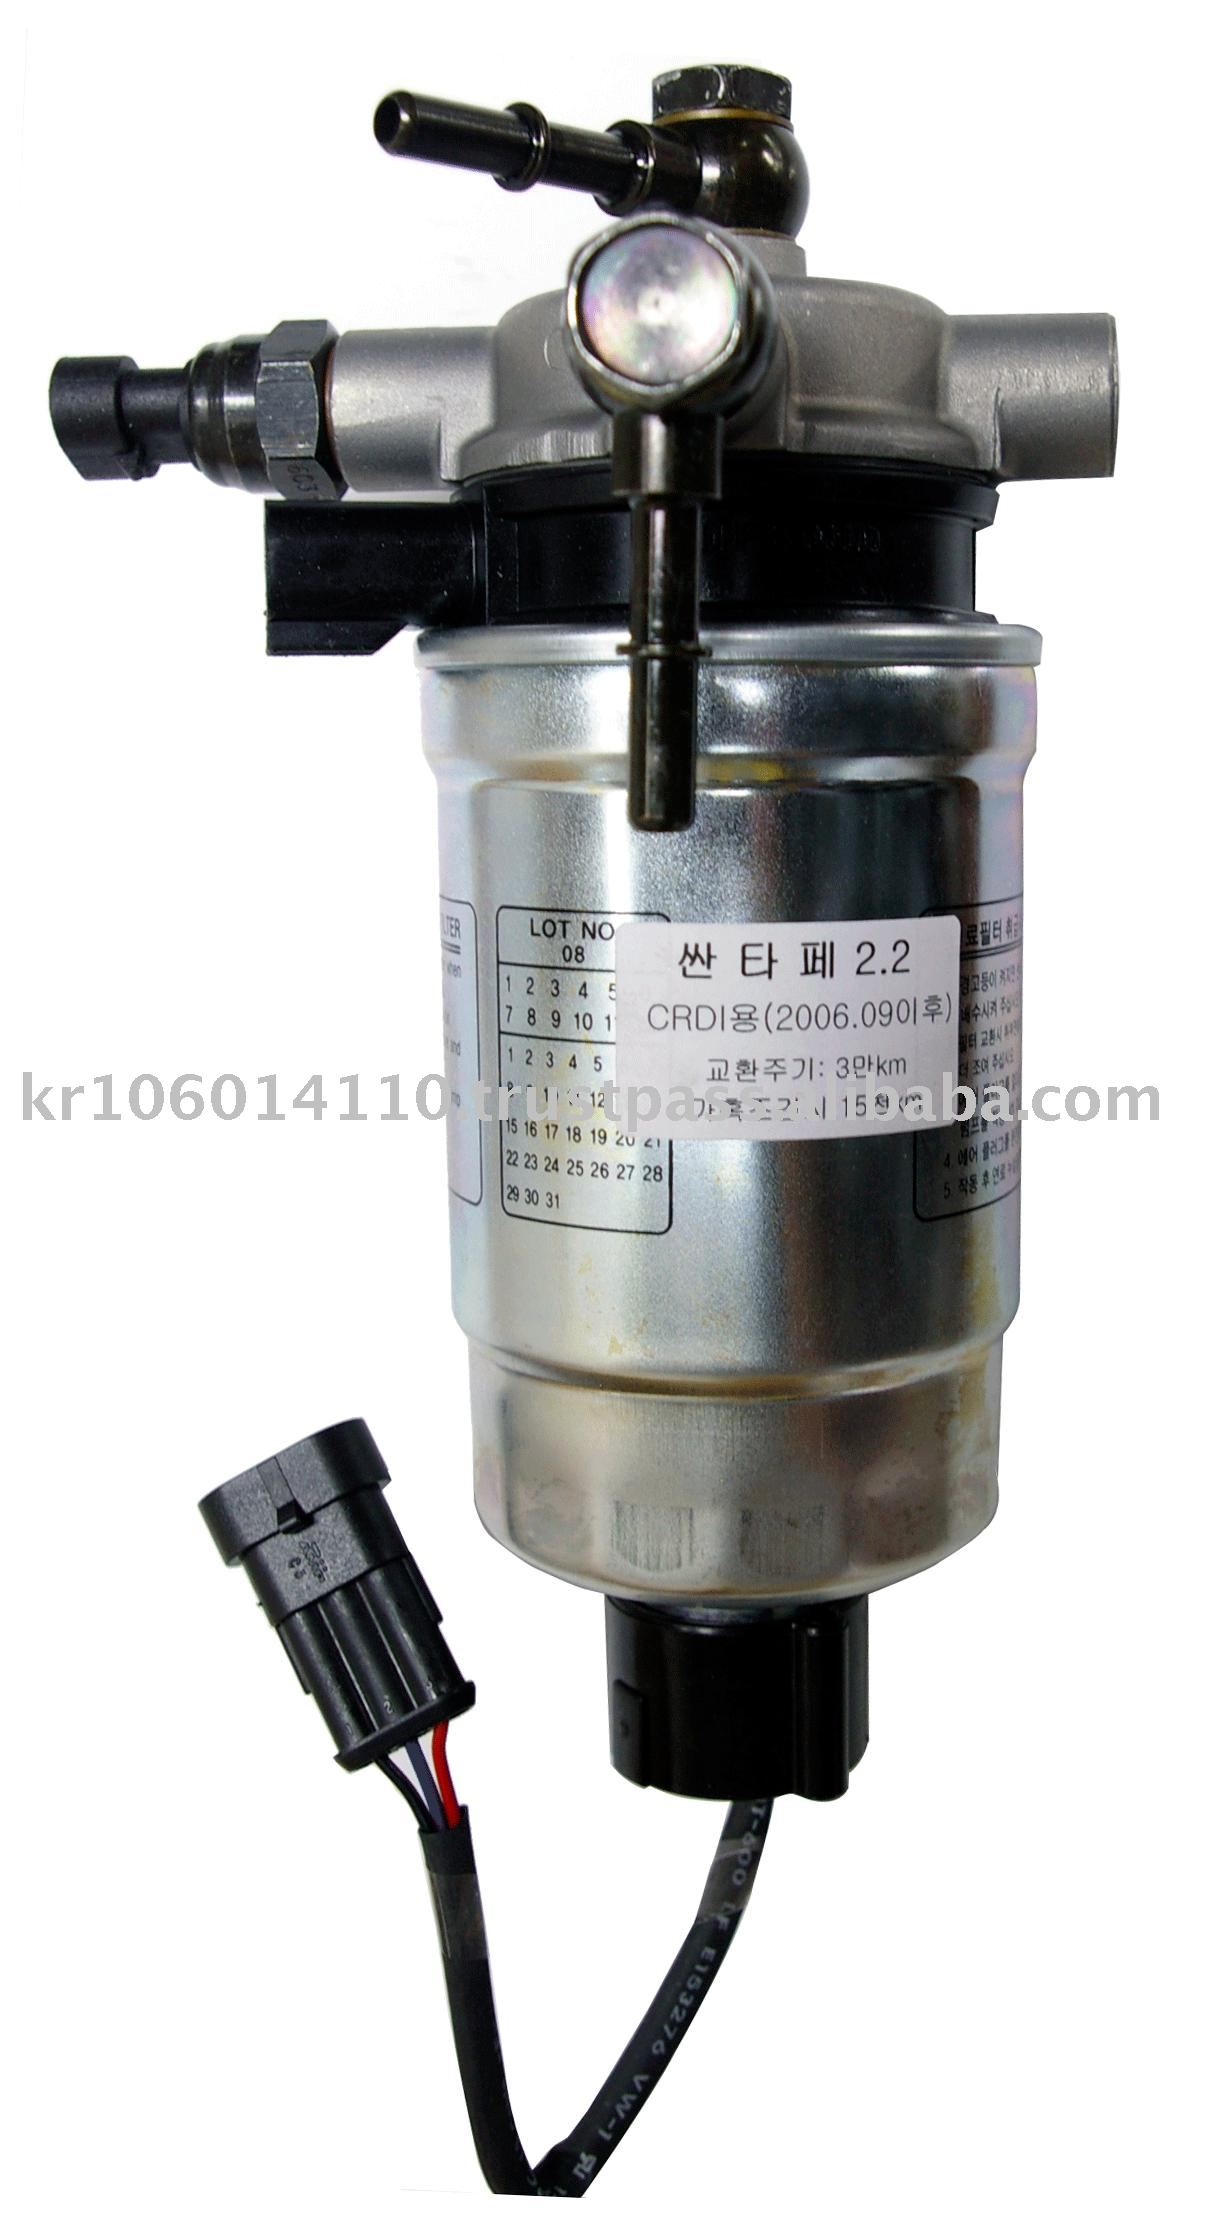 Crdi Fuel Filter(new Santafe 2.2 {hyundai} ) - Buy Car Fuel Filter,Crdi Fuel  Filter,Fuel Filter Product on Alibaba.com